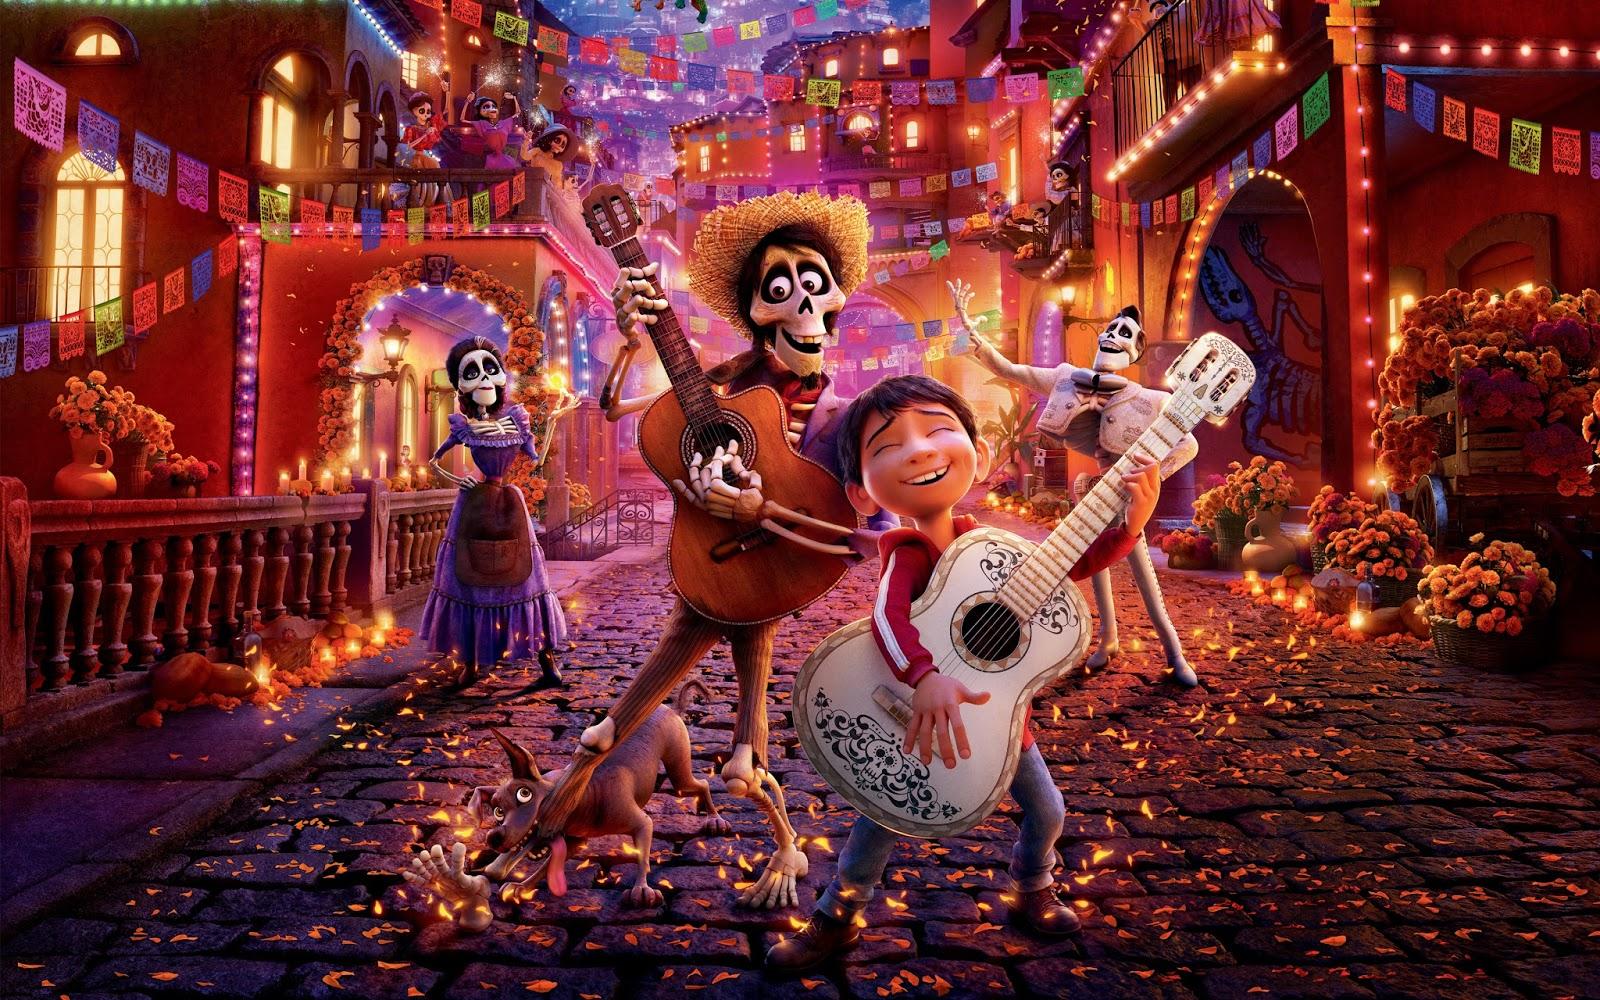 En iyi Pixar filmleri Coco filmi